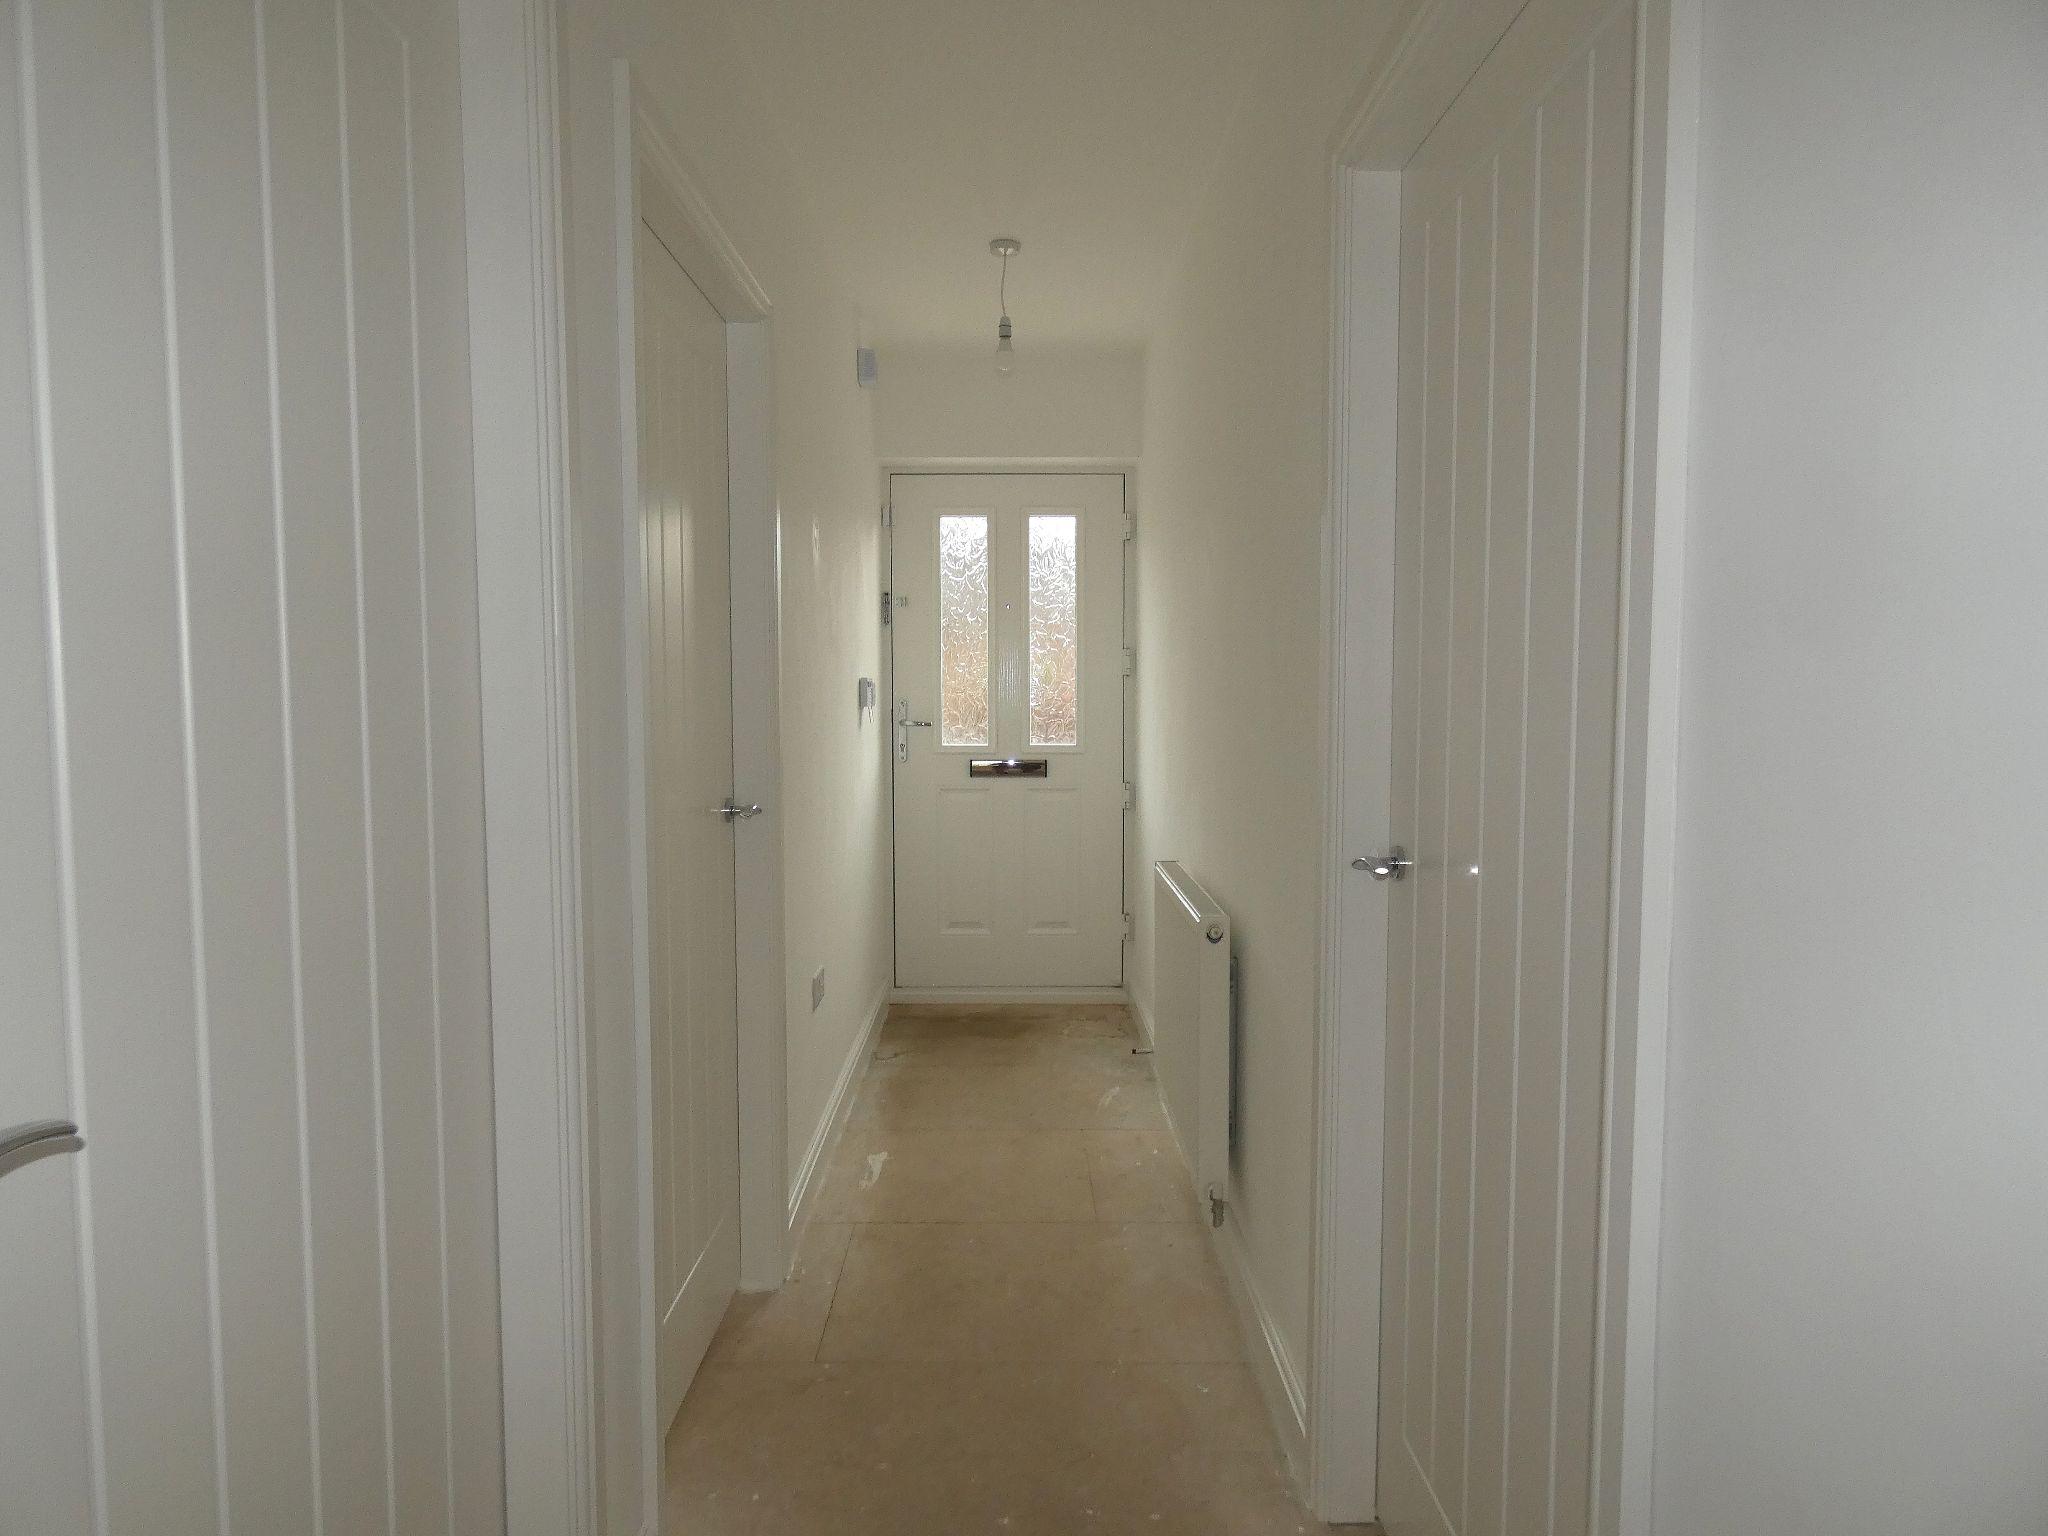 2 bedroom detached bungalow SSTC in Bishop Auckland - Entrance Hallway.